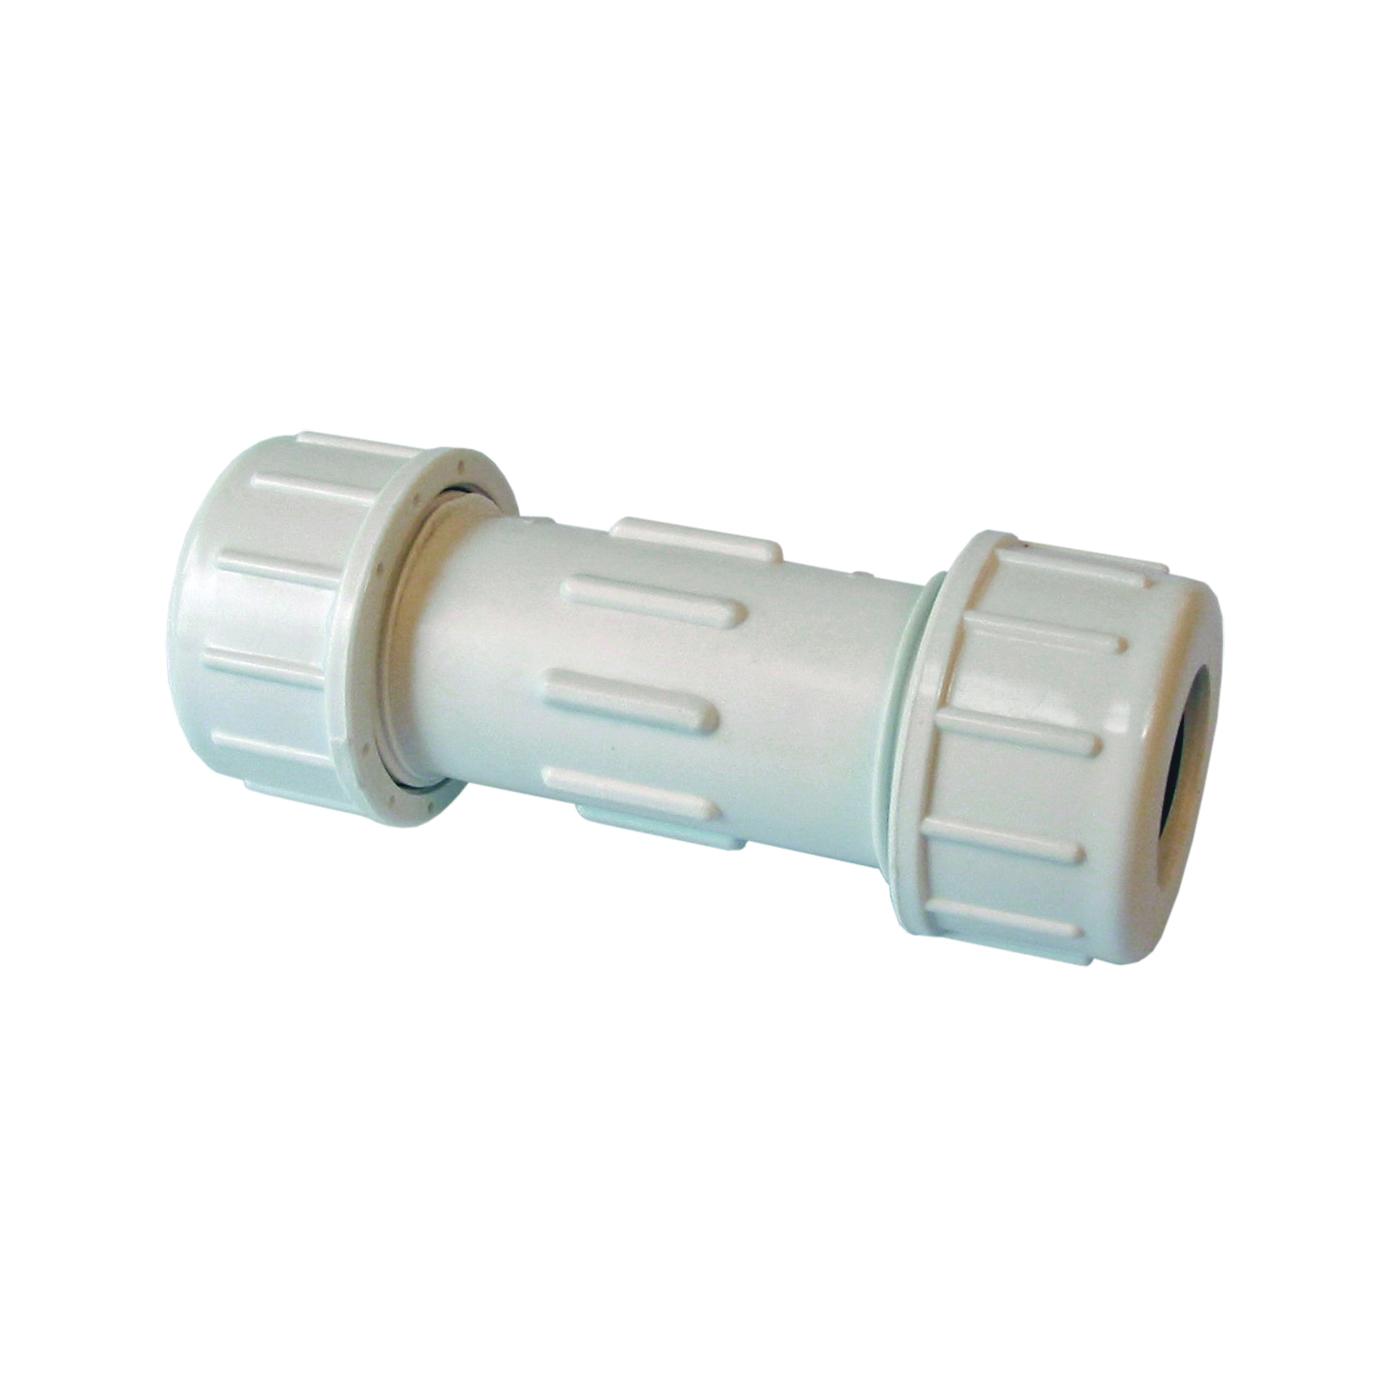 Picture of AMERICAN VALVE P600U 1-1/2 Compression Coupler, 1-1/2 in, Compression, SCH 40 Schedule, 150 psi Pressure